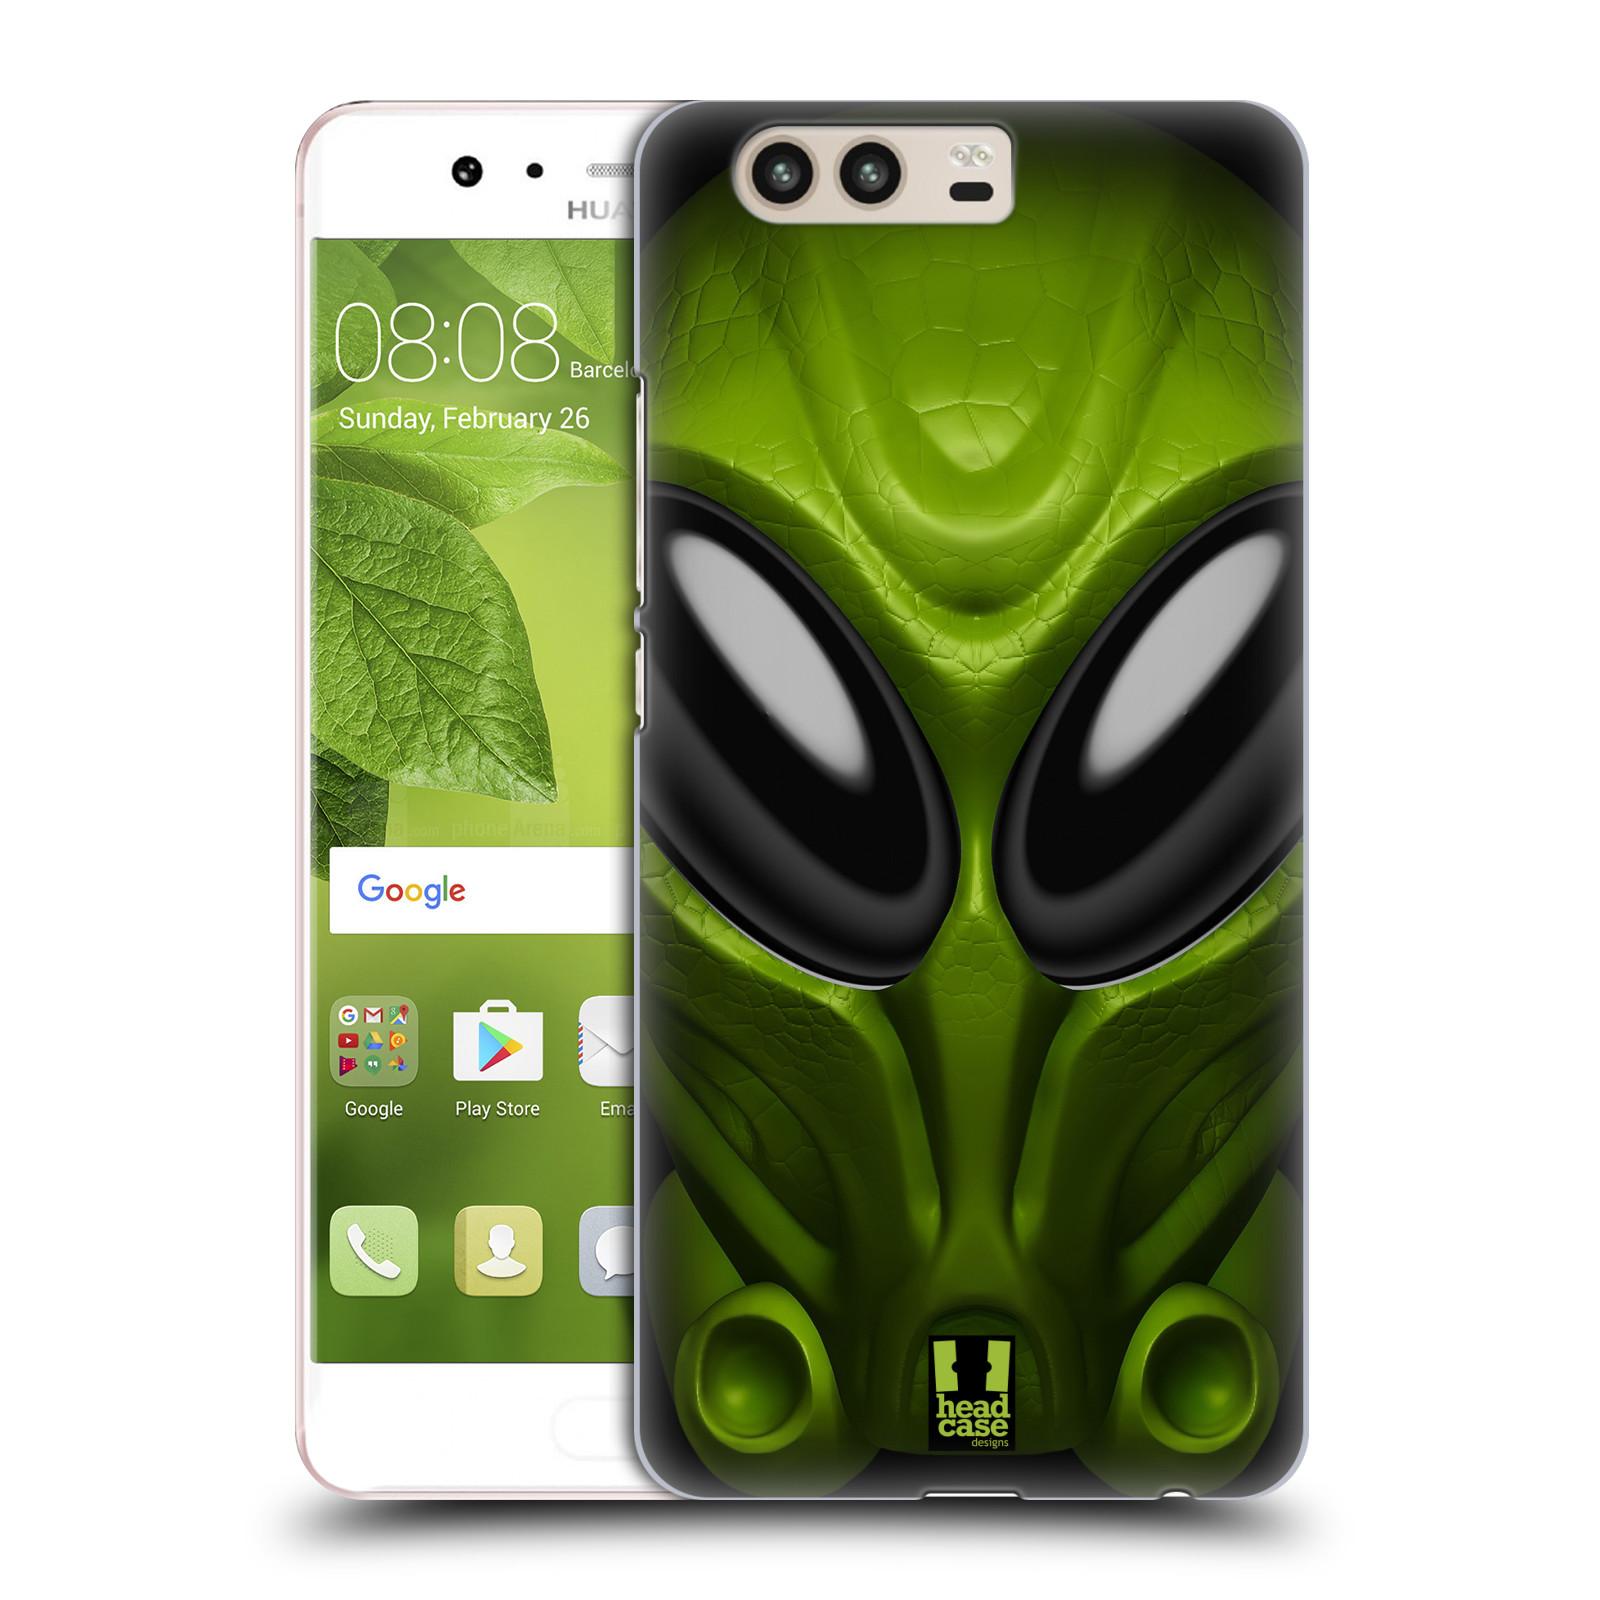 Plastové pouzdro na mobil Huawei P10 - Head Case - Ufoun Mastermind (Plastový kryt či obal na mobilní telefon s motivem Ufouna Masterminda pro Huawei P10 (Dual SIM))